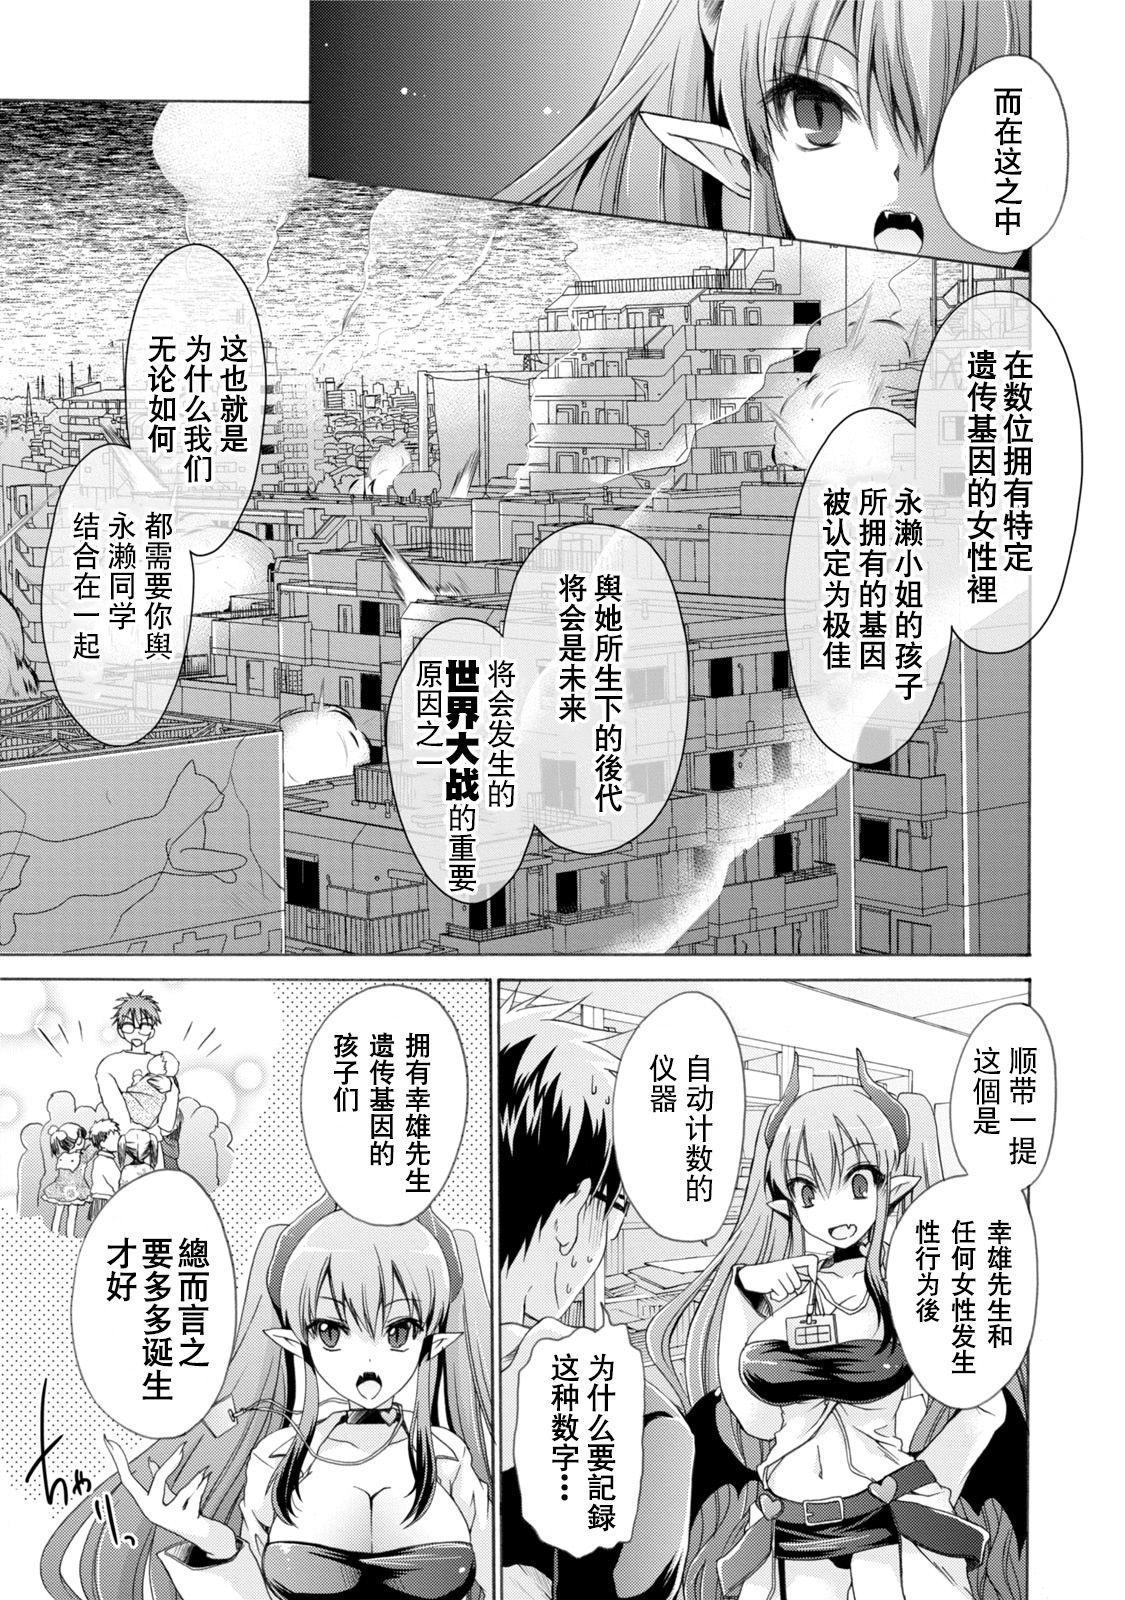 [Shinonome Ryu] Ore to Kanojo to Owaru Sekai - World's end LoveStory 1-5 [Chinese] [爱弹幕汉化组] [Digital] 32